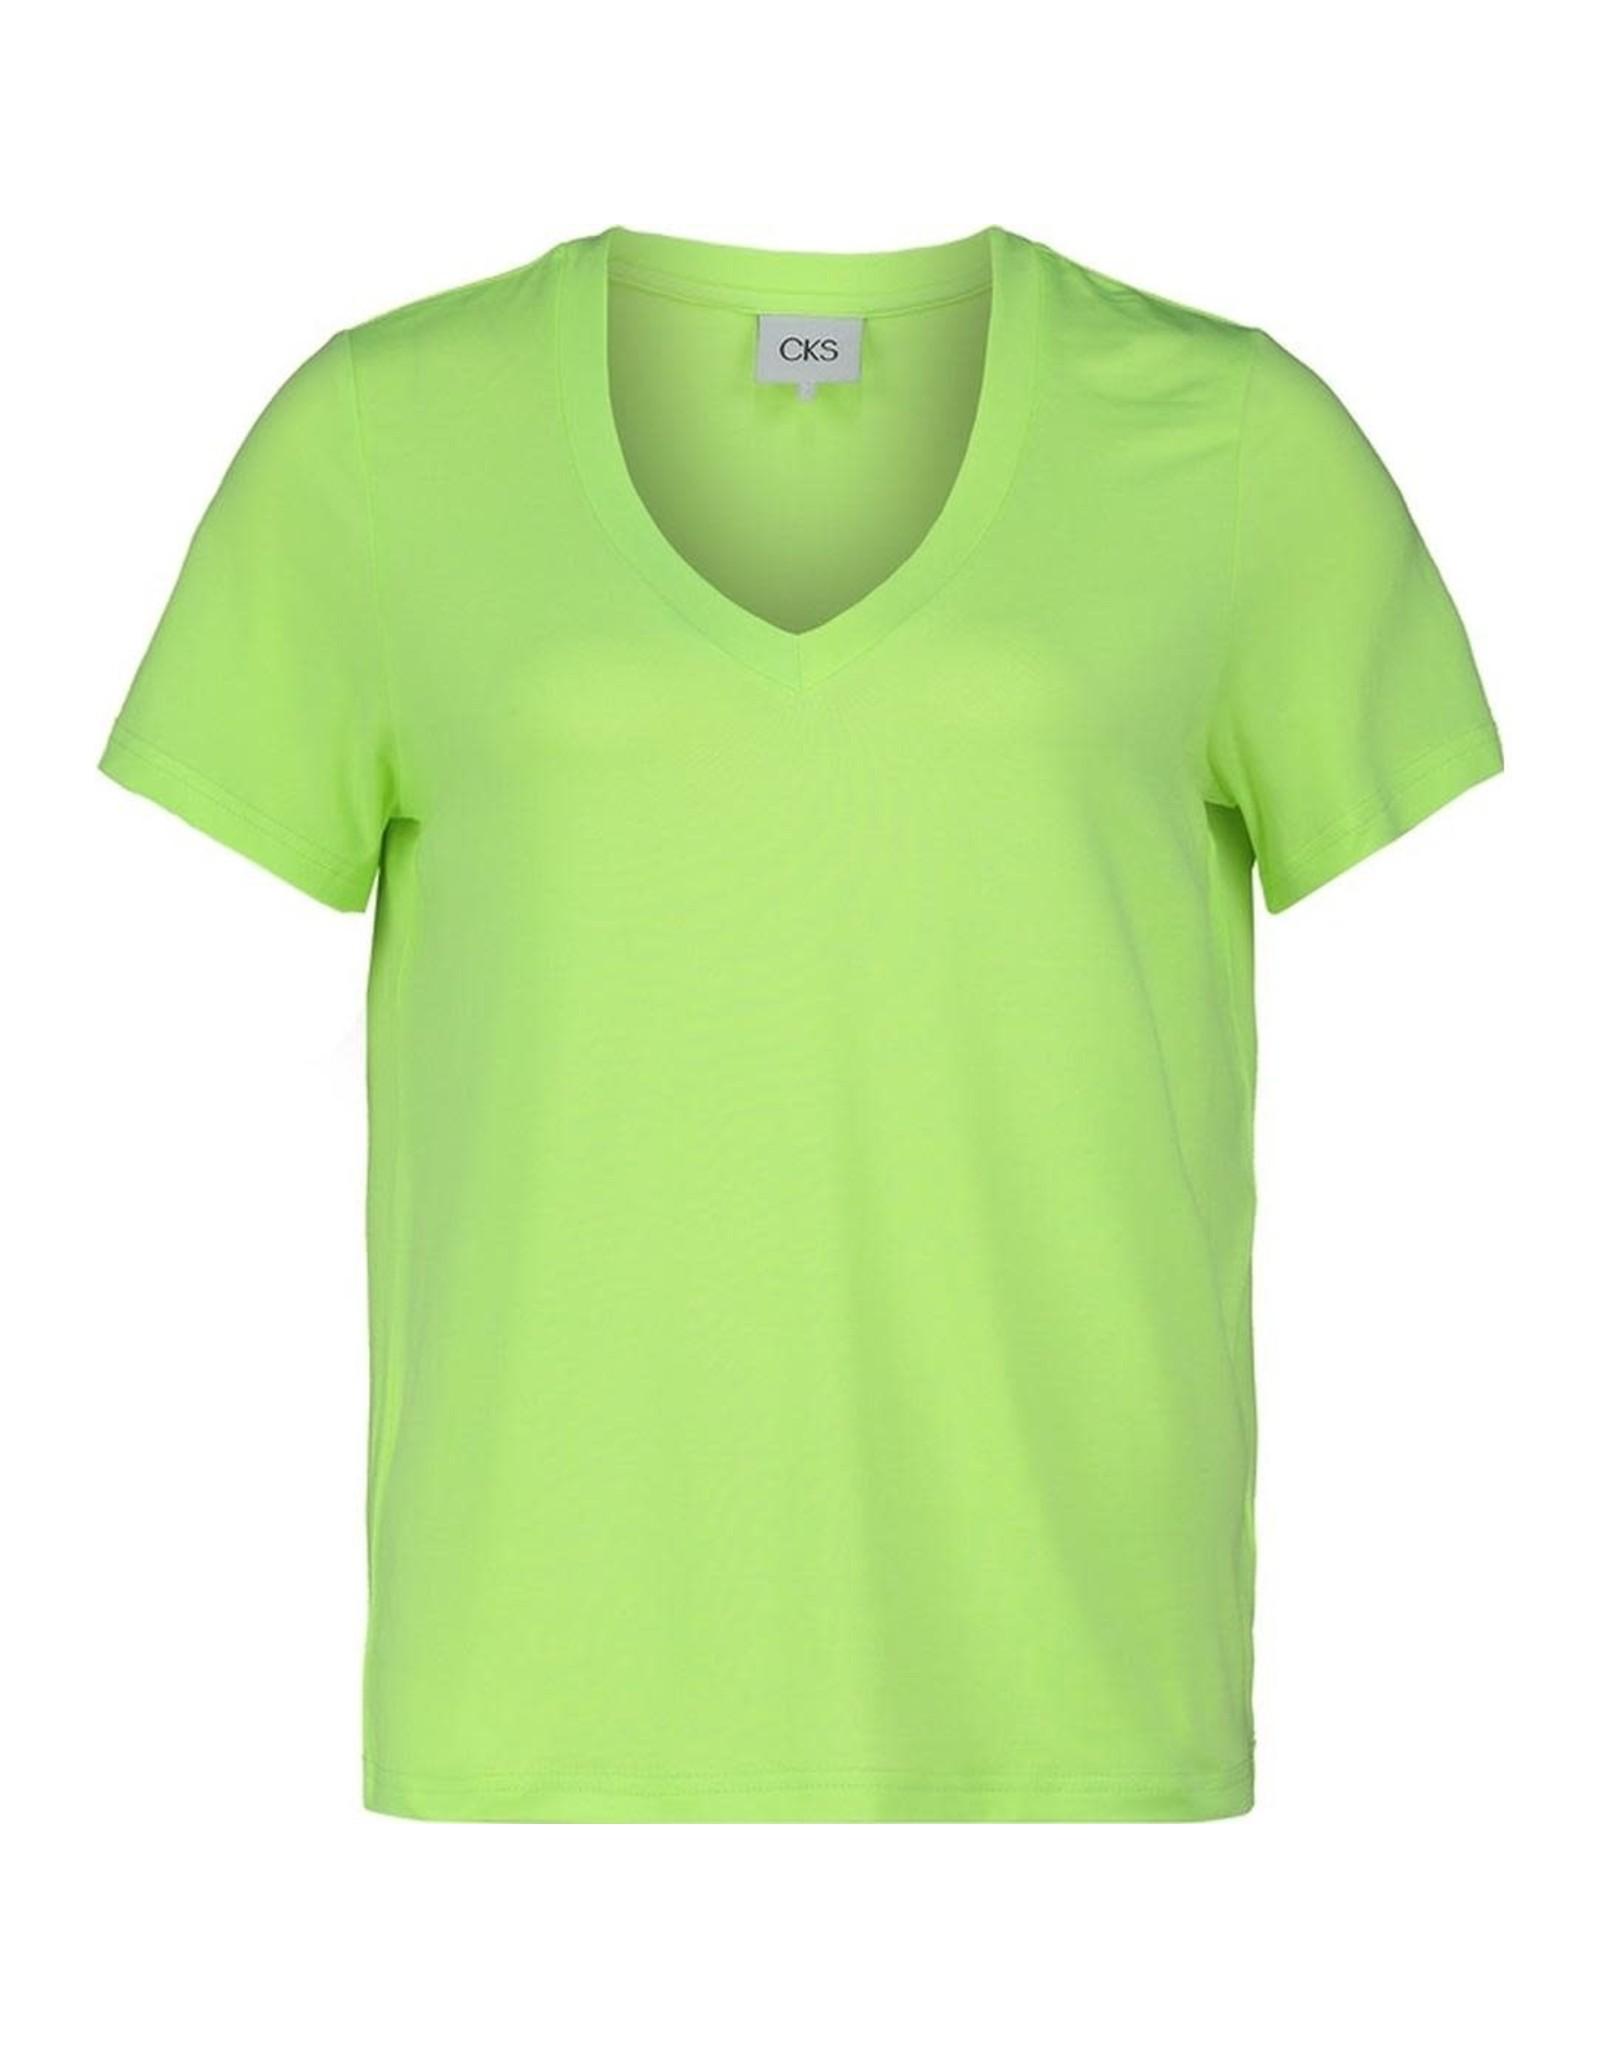 CKS T-shirt Nebony Soft Flavin